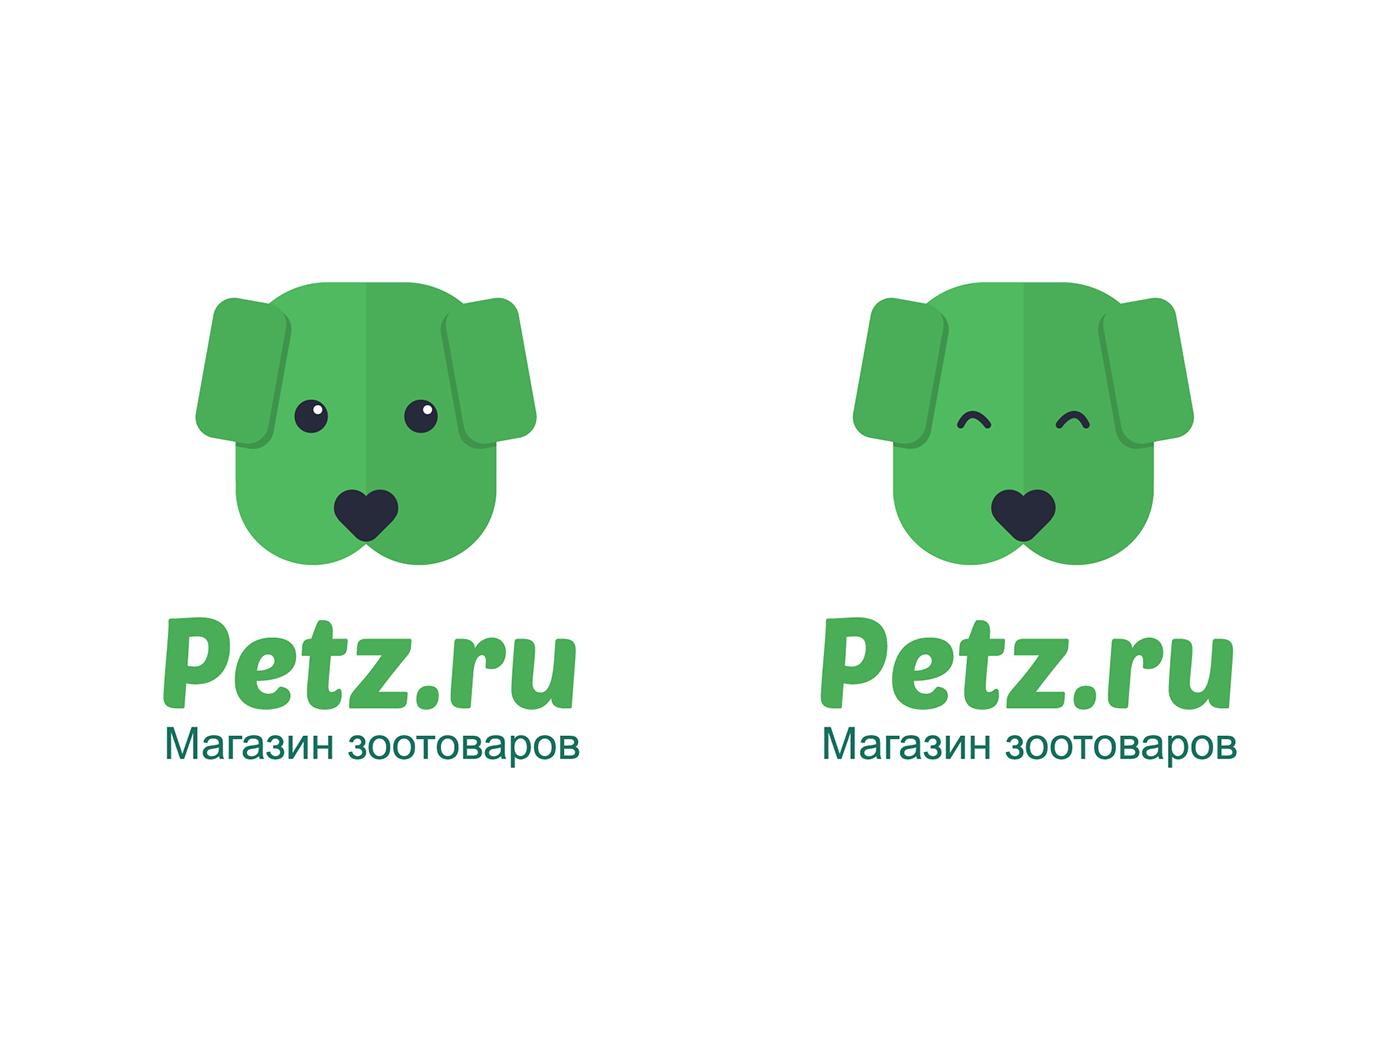 dog cute puppy green logo pets animal логотип вектор собака